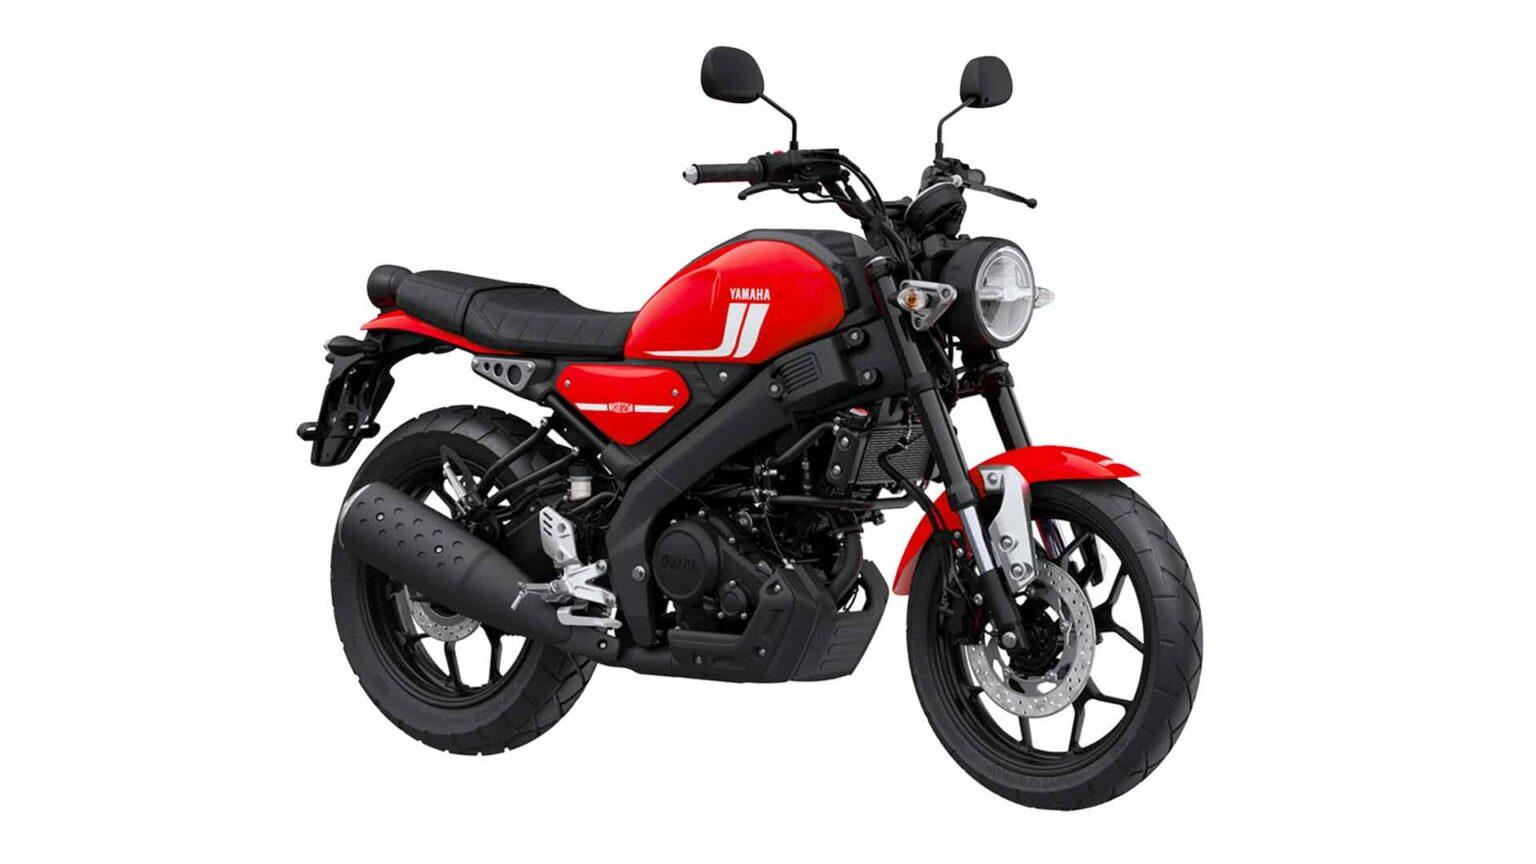 Yamaha Fazer Fi V2 Price In Bangladesh 2021 - BikeBaz